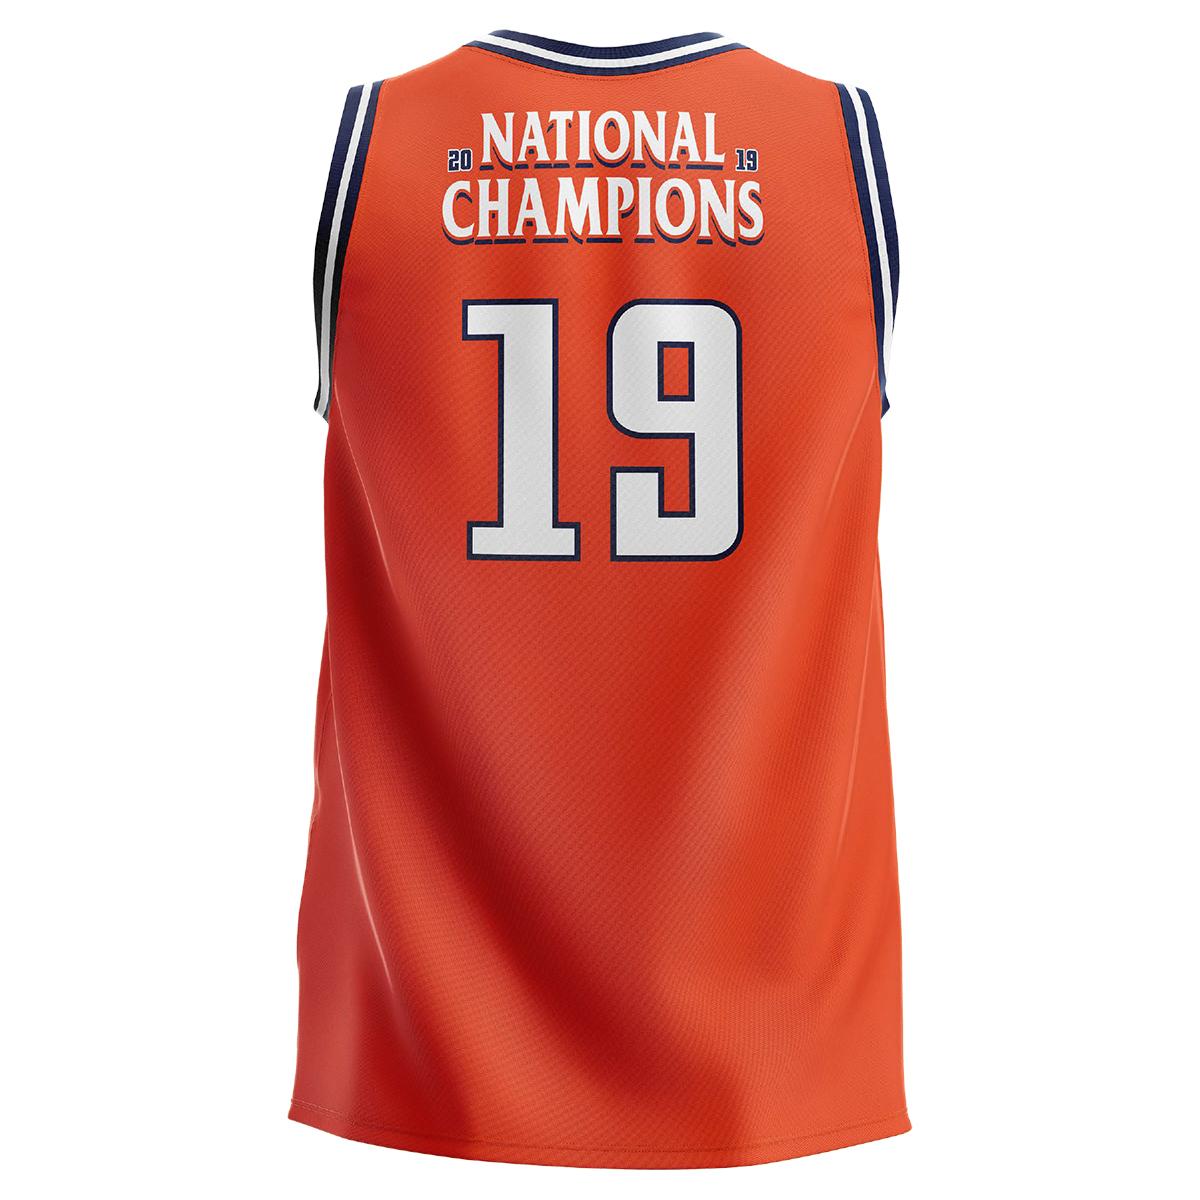 UVA 2019 National Champions Youth Orange Jersey